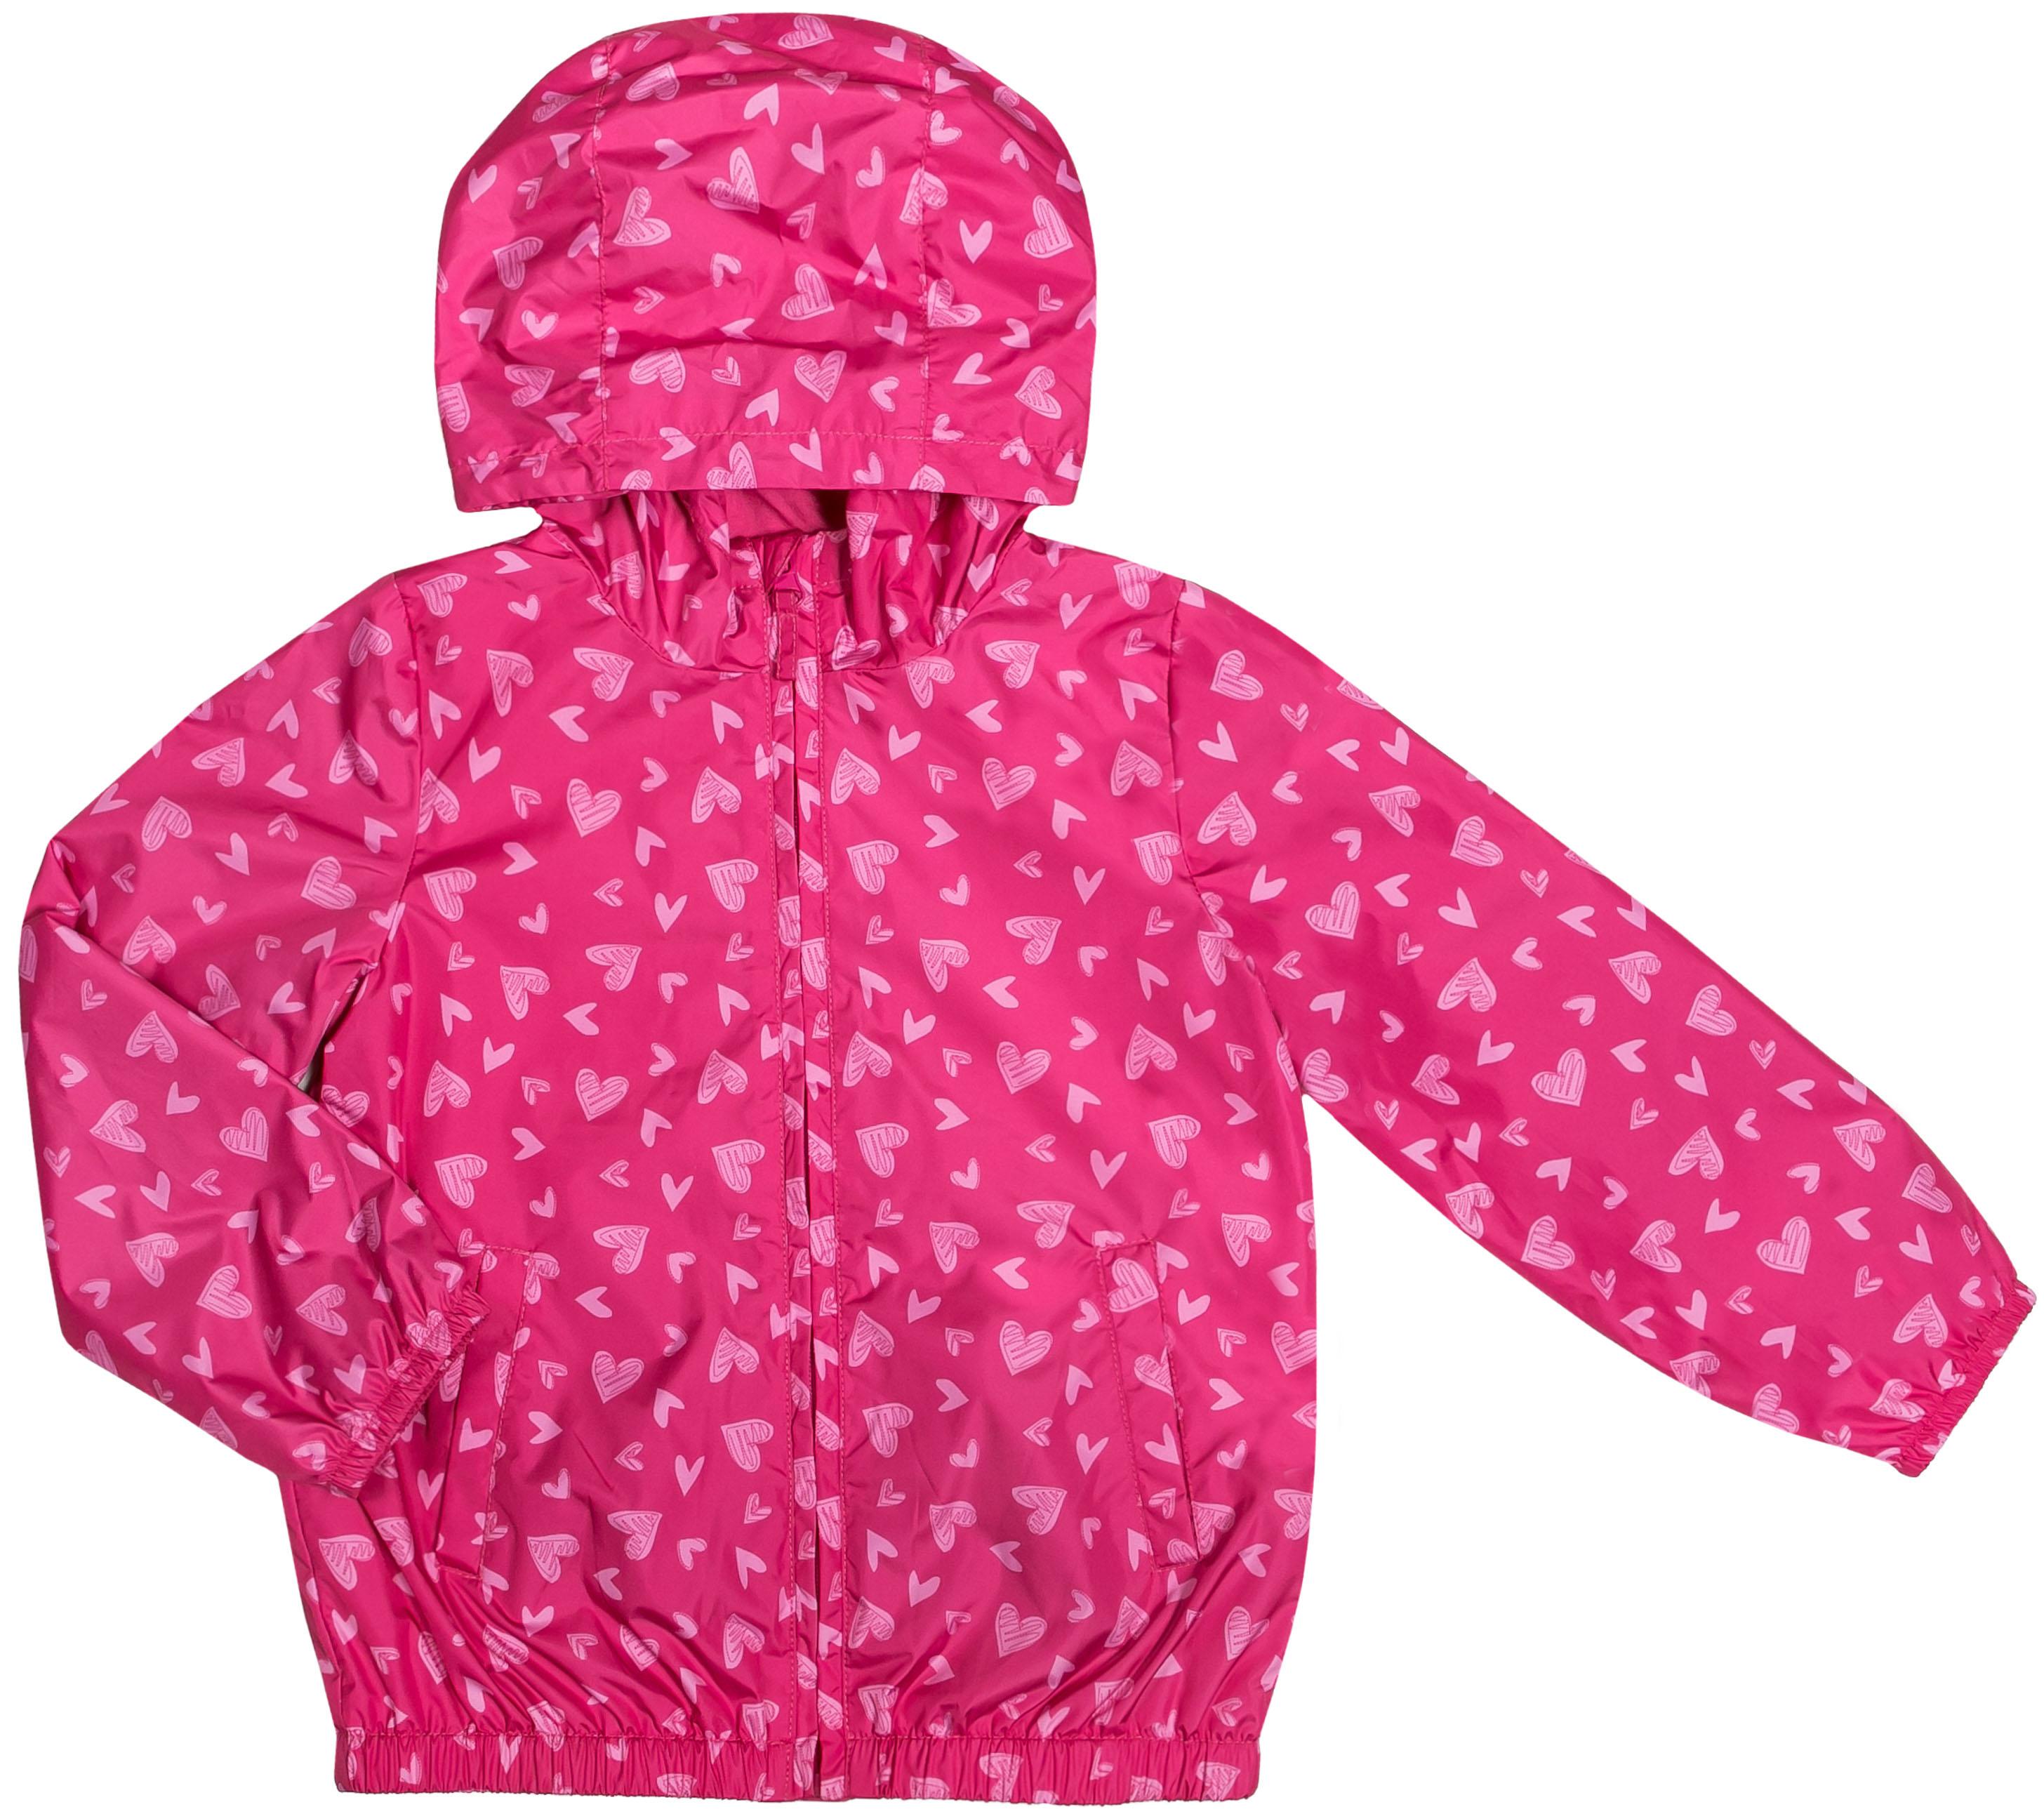 Фото - Куртка Barkito для девочки куртки пальто пуховики coccodrillo куртка для девочки wild at heart